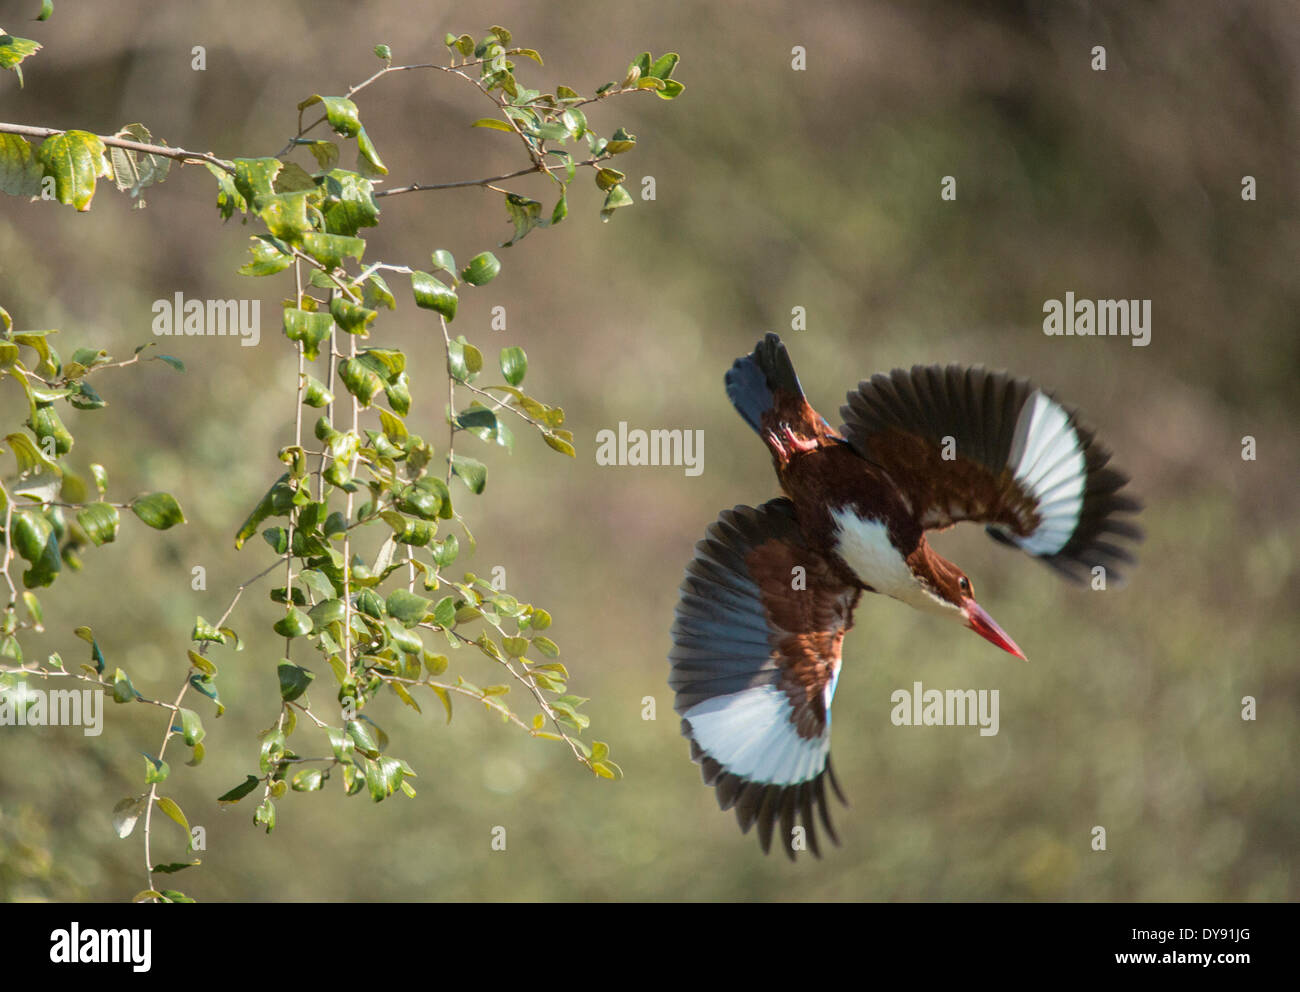 India, kingfisher, Ranthambore, parque nacional, de Asia, de la India, Rajastán, animales Imagen De Stock